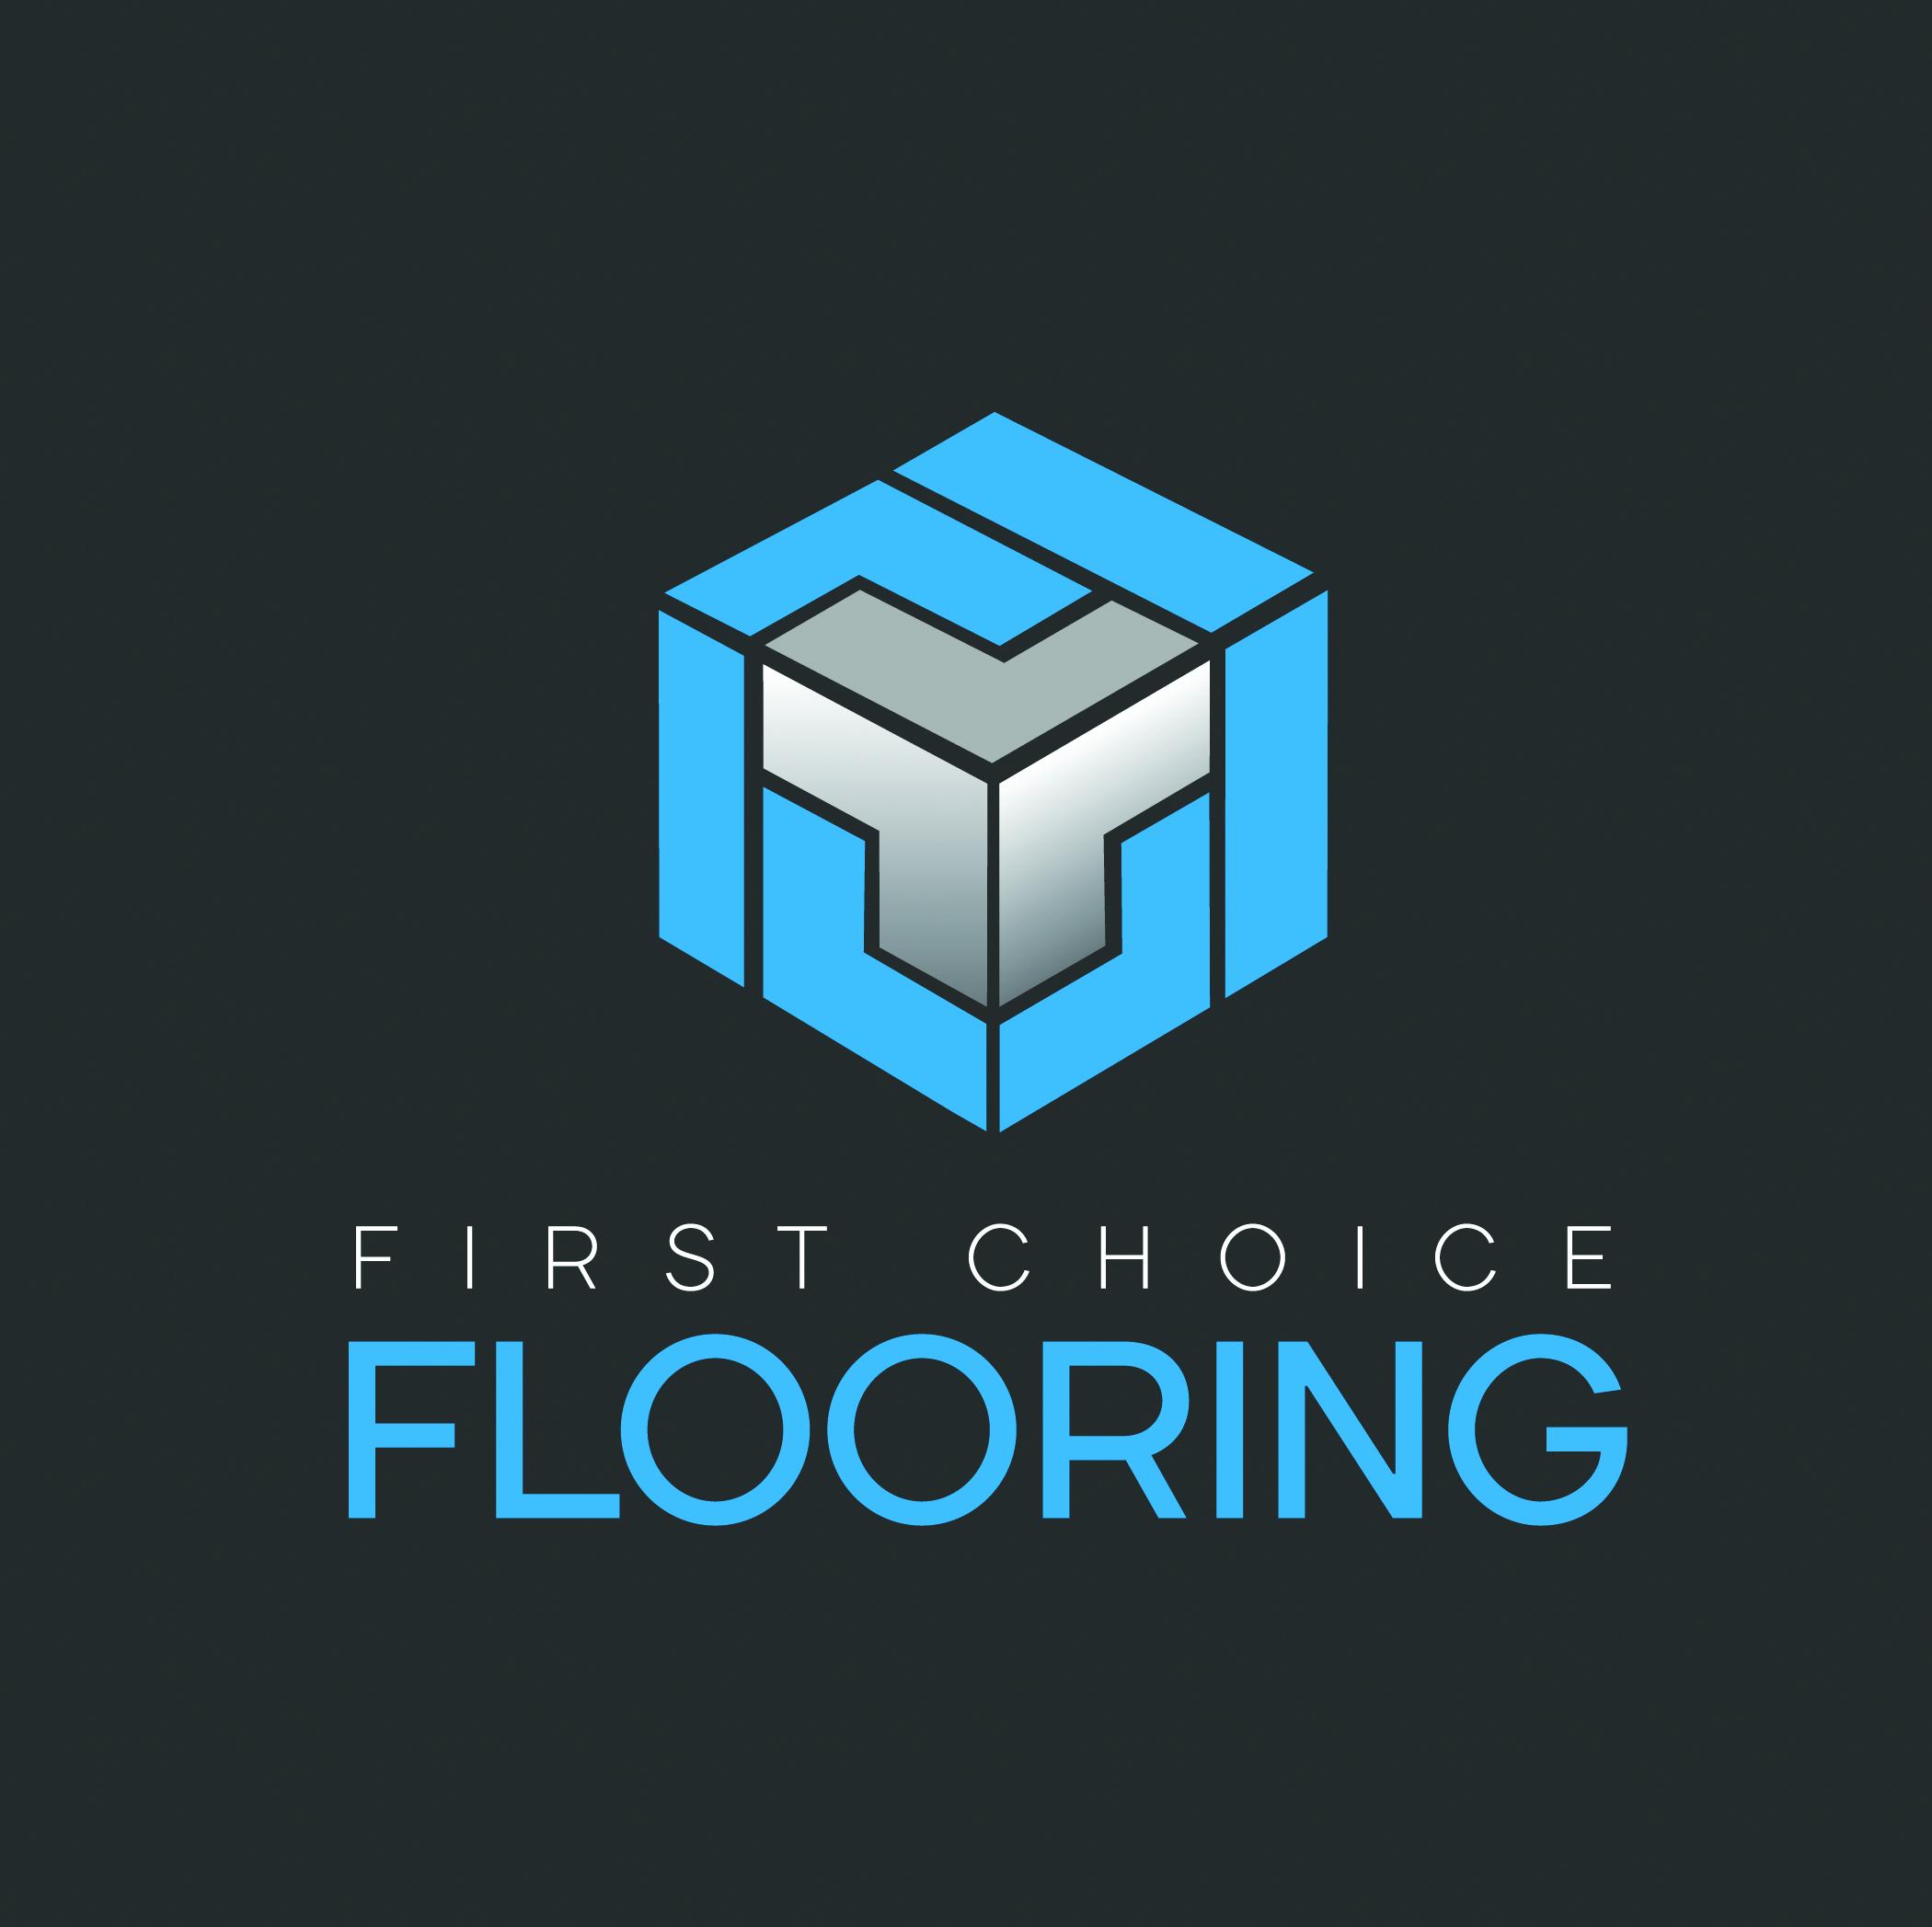 5. First Choice Flooring SQUARE DARK GRAY CMYK.jpg